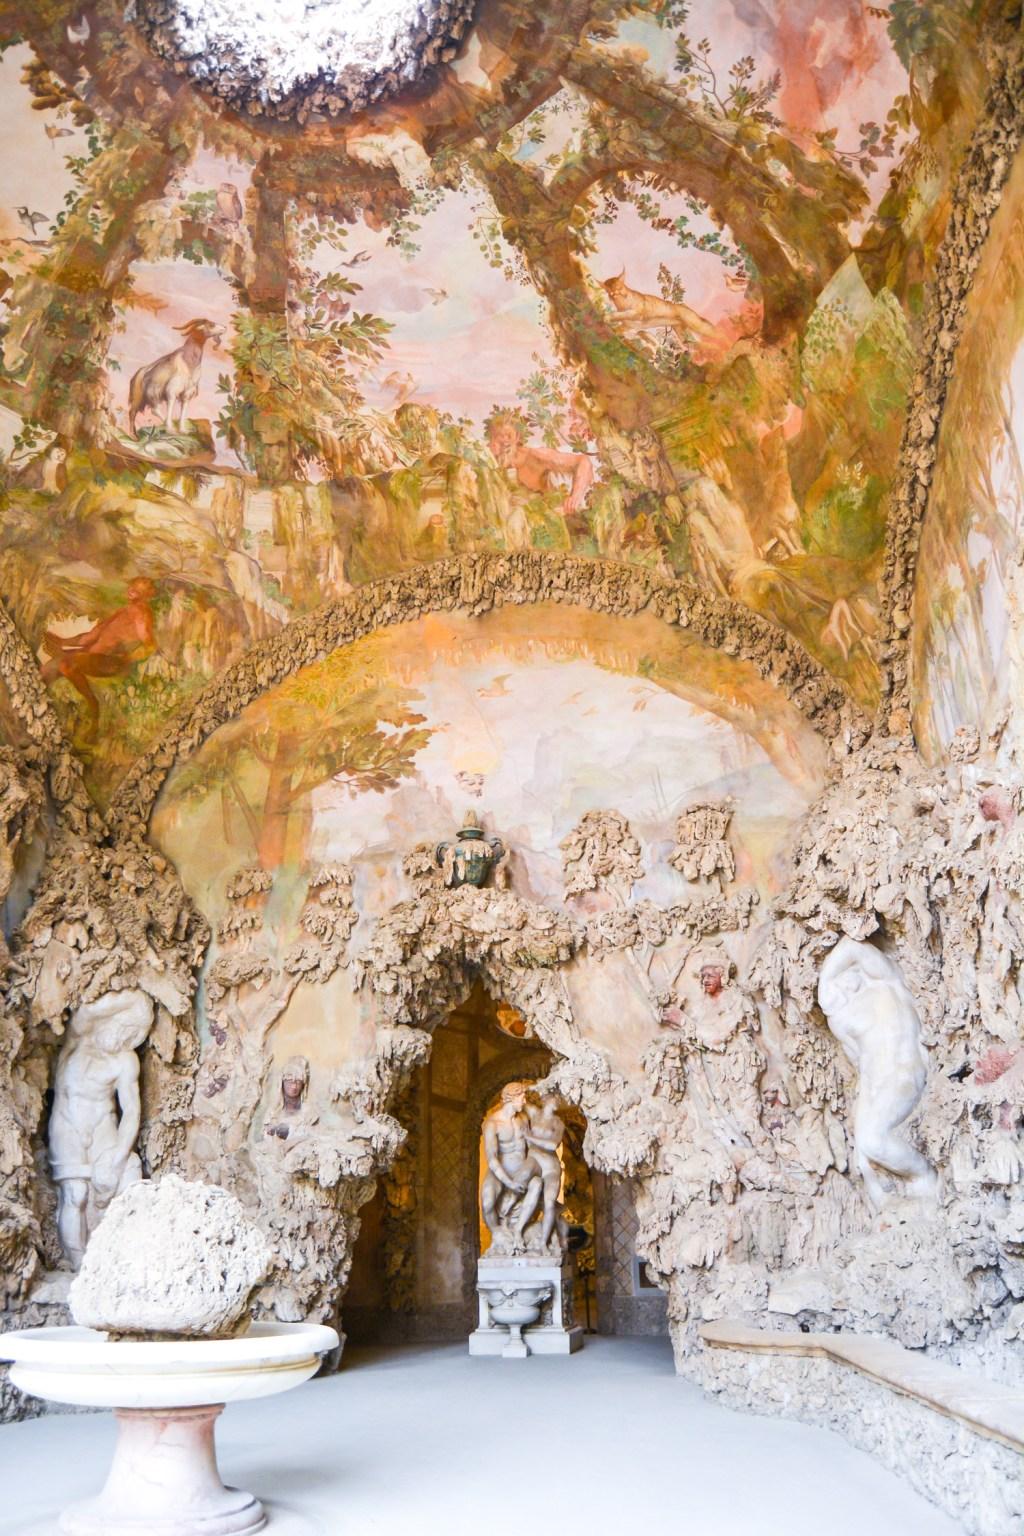 The Boboli Gardens of Pitti Palace- @lacegraceblog1